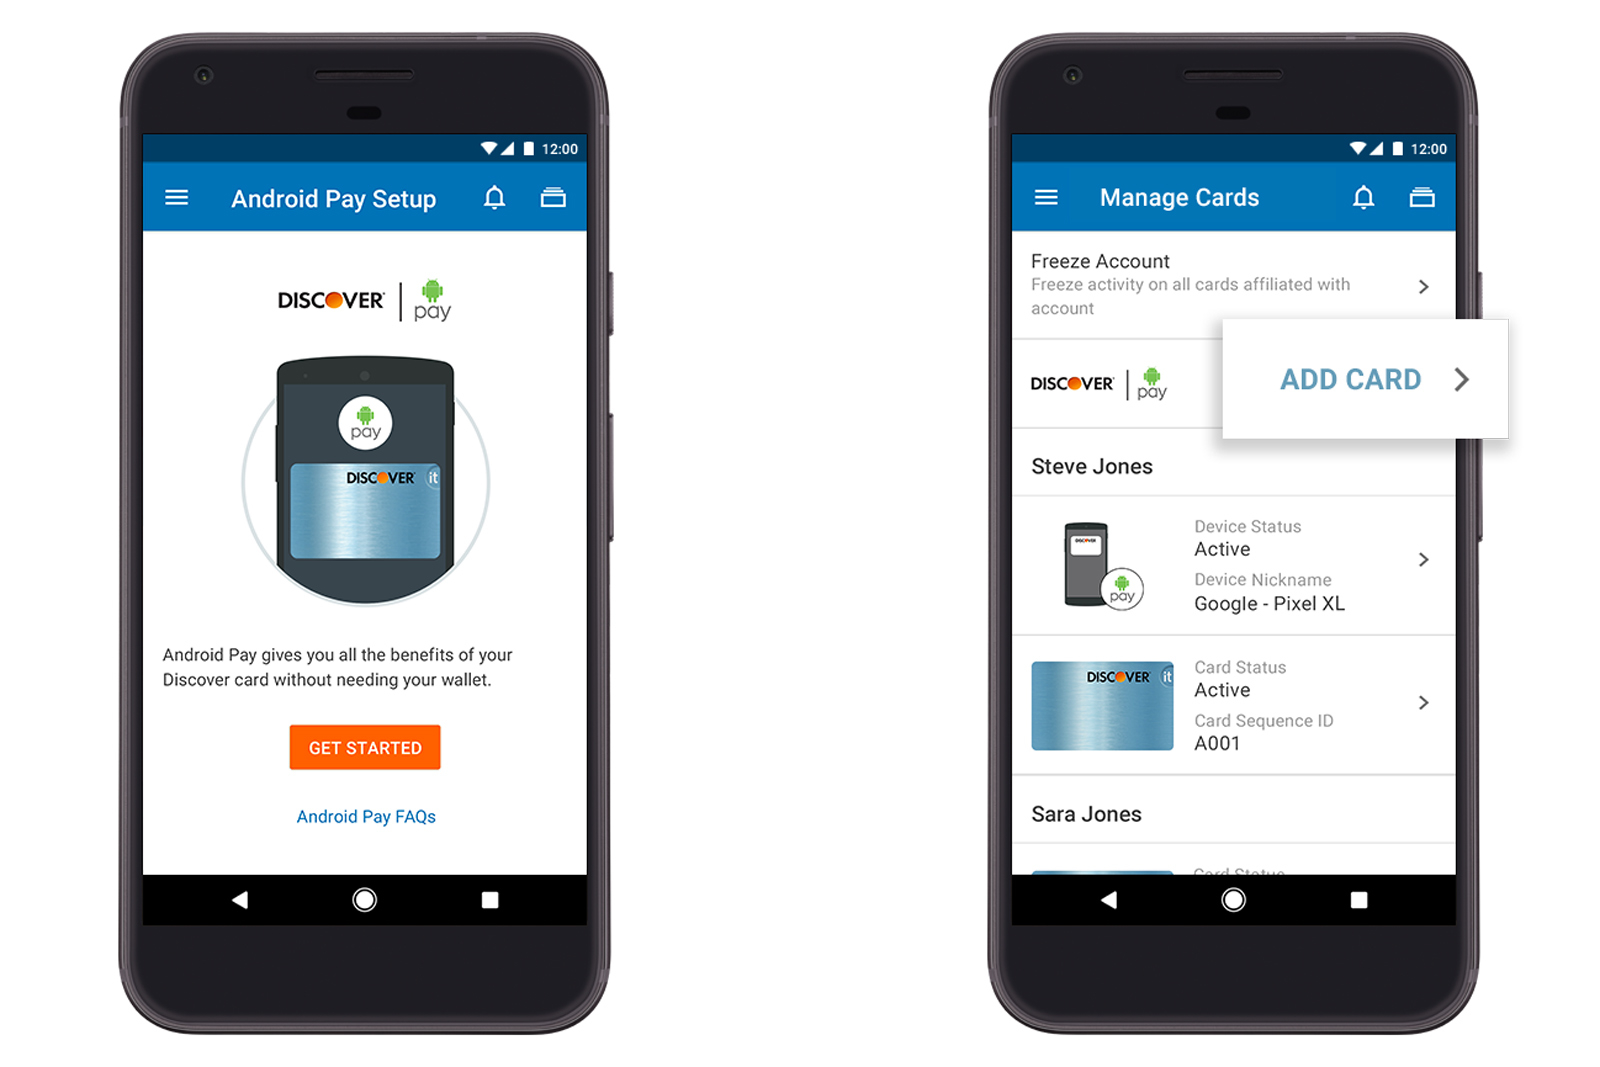 Google integra Android Pay en aplicaciones de mobile banking